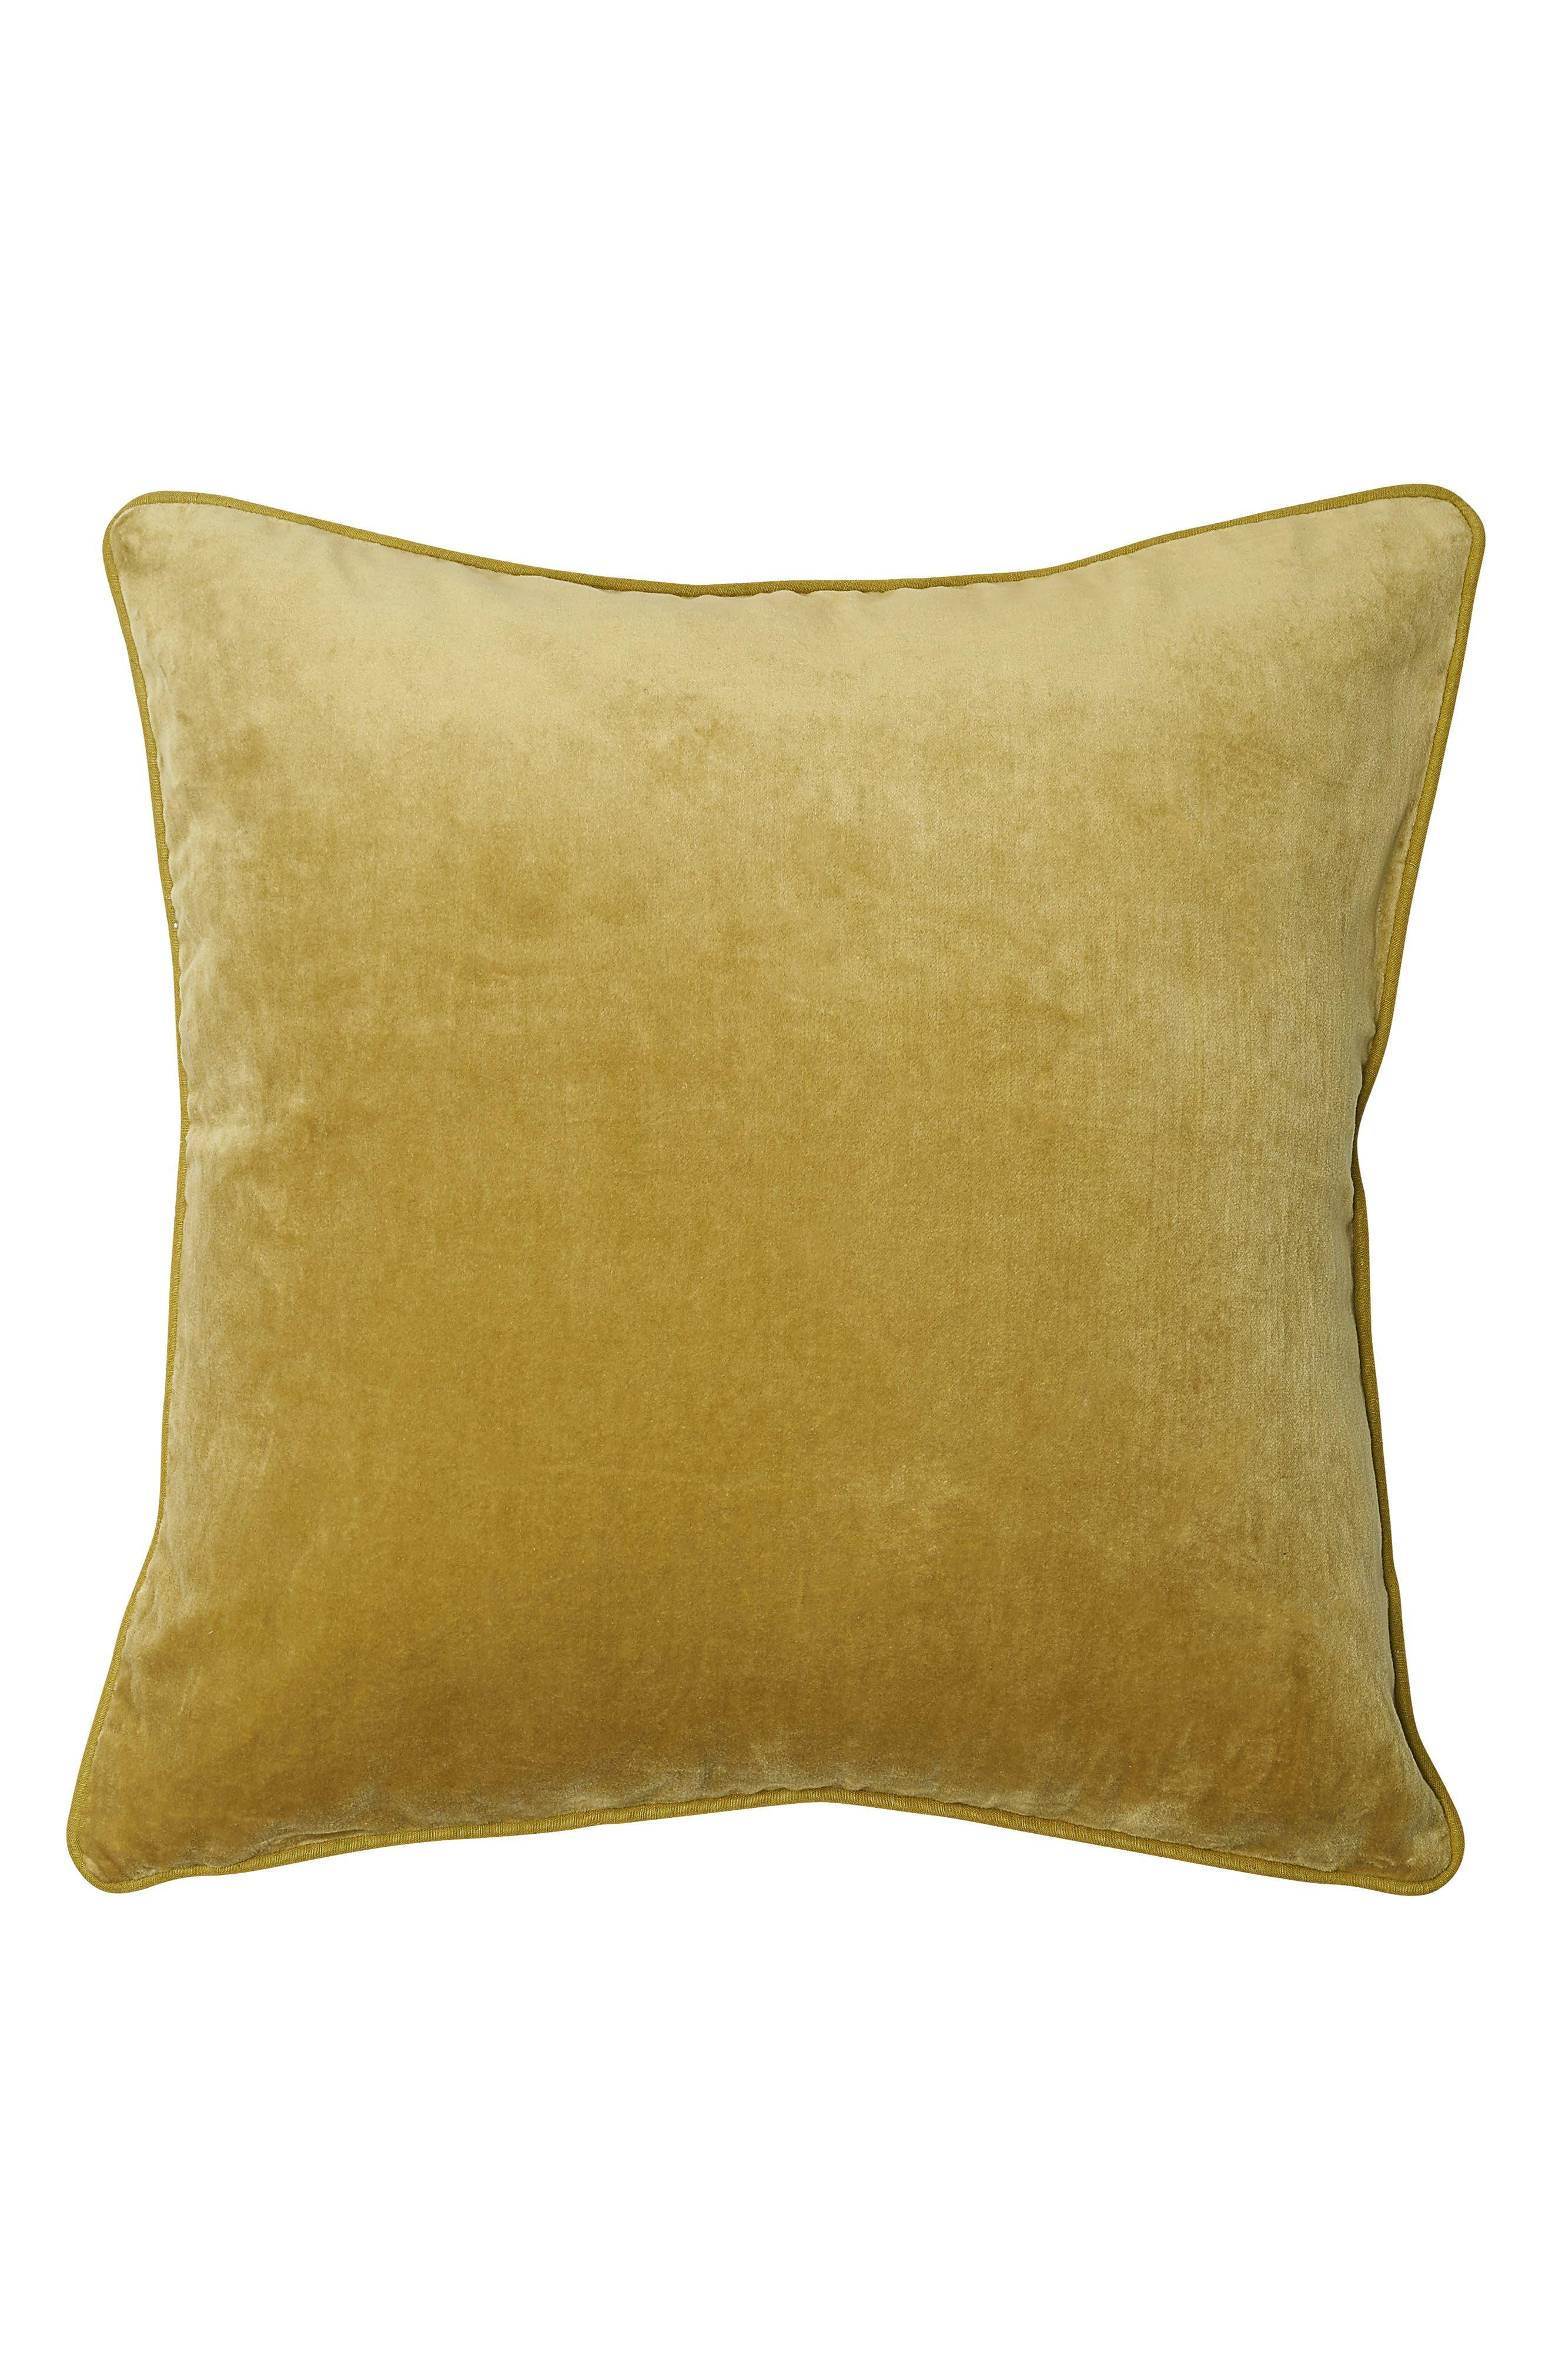 EADIE LIFESTYLE, Lynette Velvet Scatter Accent Pillow, Main thumbnail 1, color, LIME